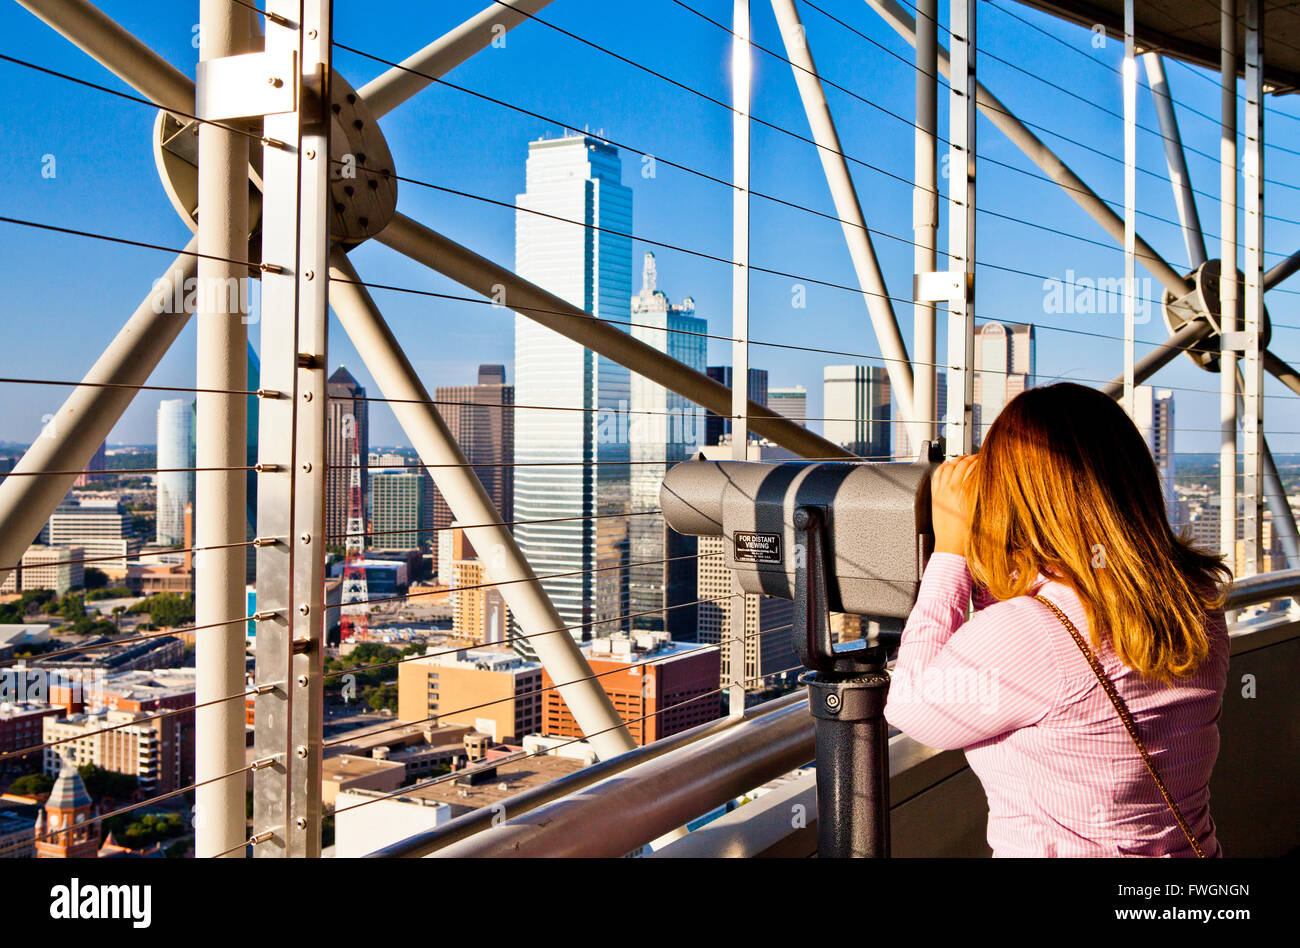 Skyline desde Reunion Tower, Dallas, Texas, Estados Unidos de América, América del Norte Foto de stock